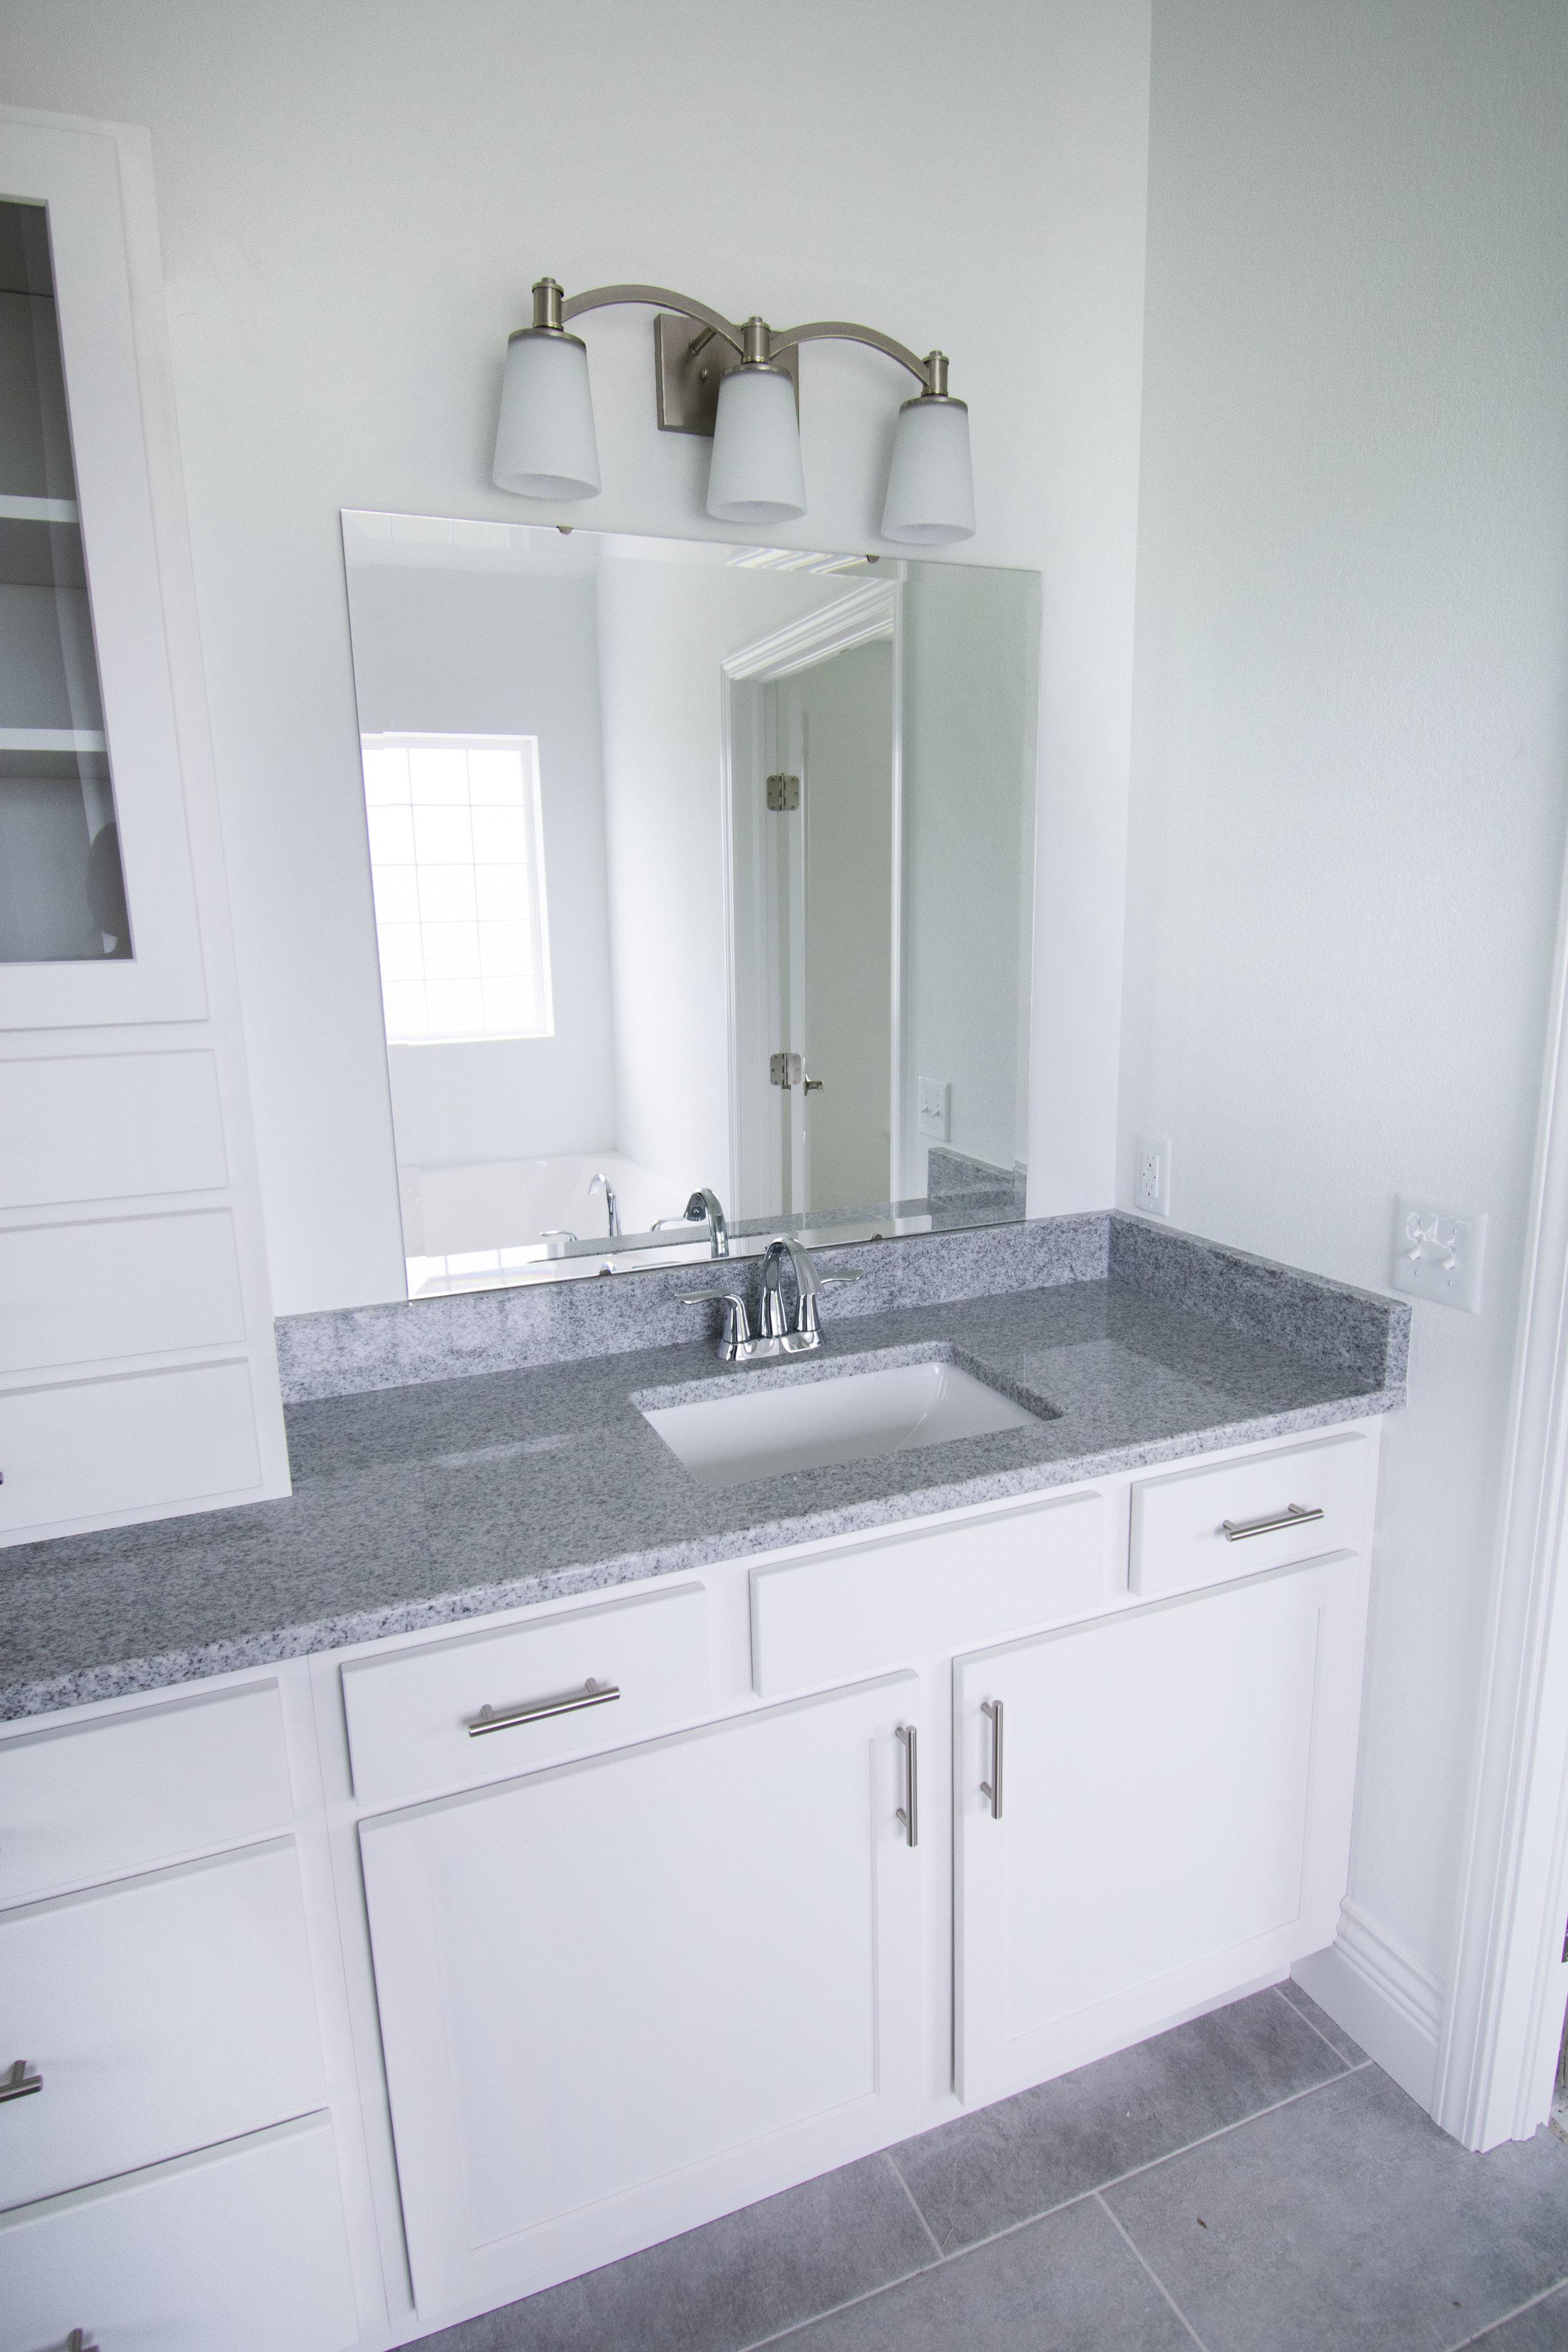 Double Bathroom Mirrors 6-18-18 3.jpg